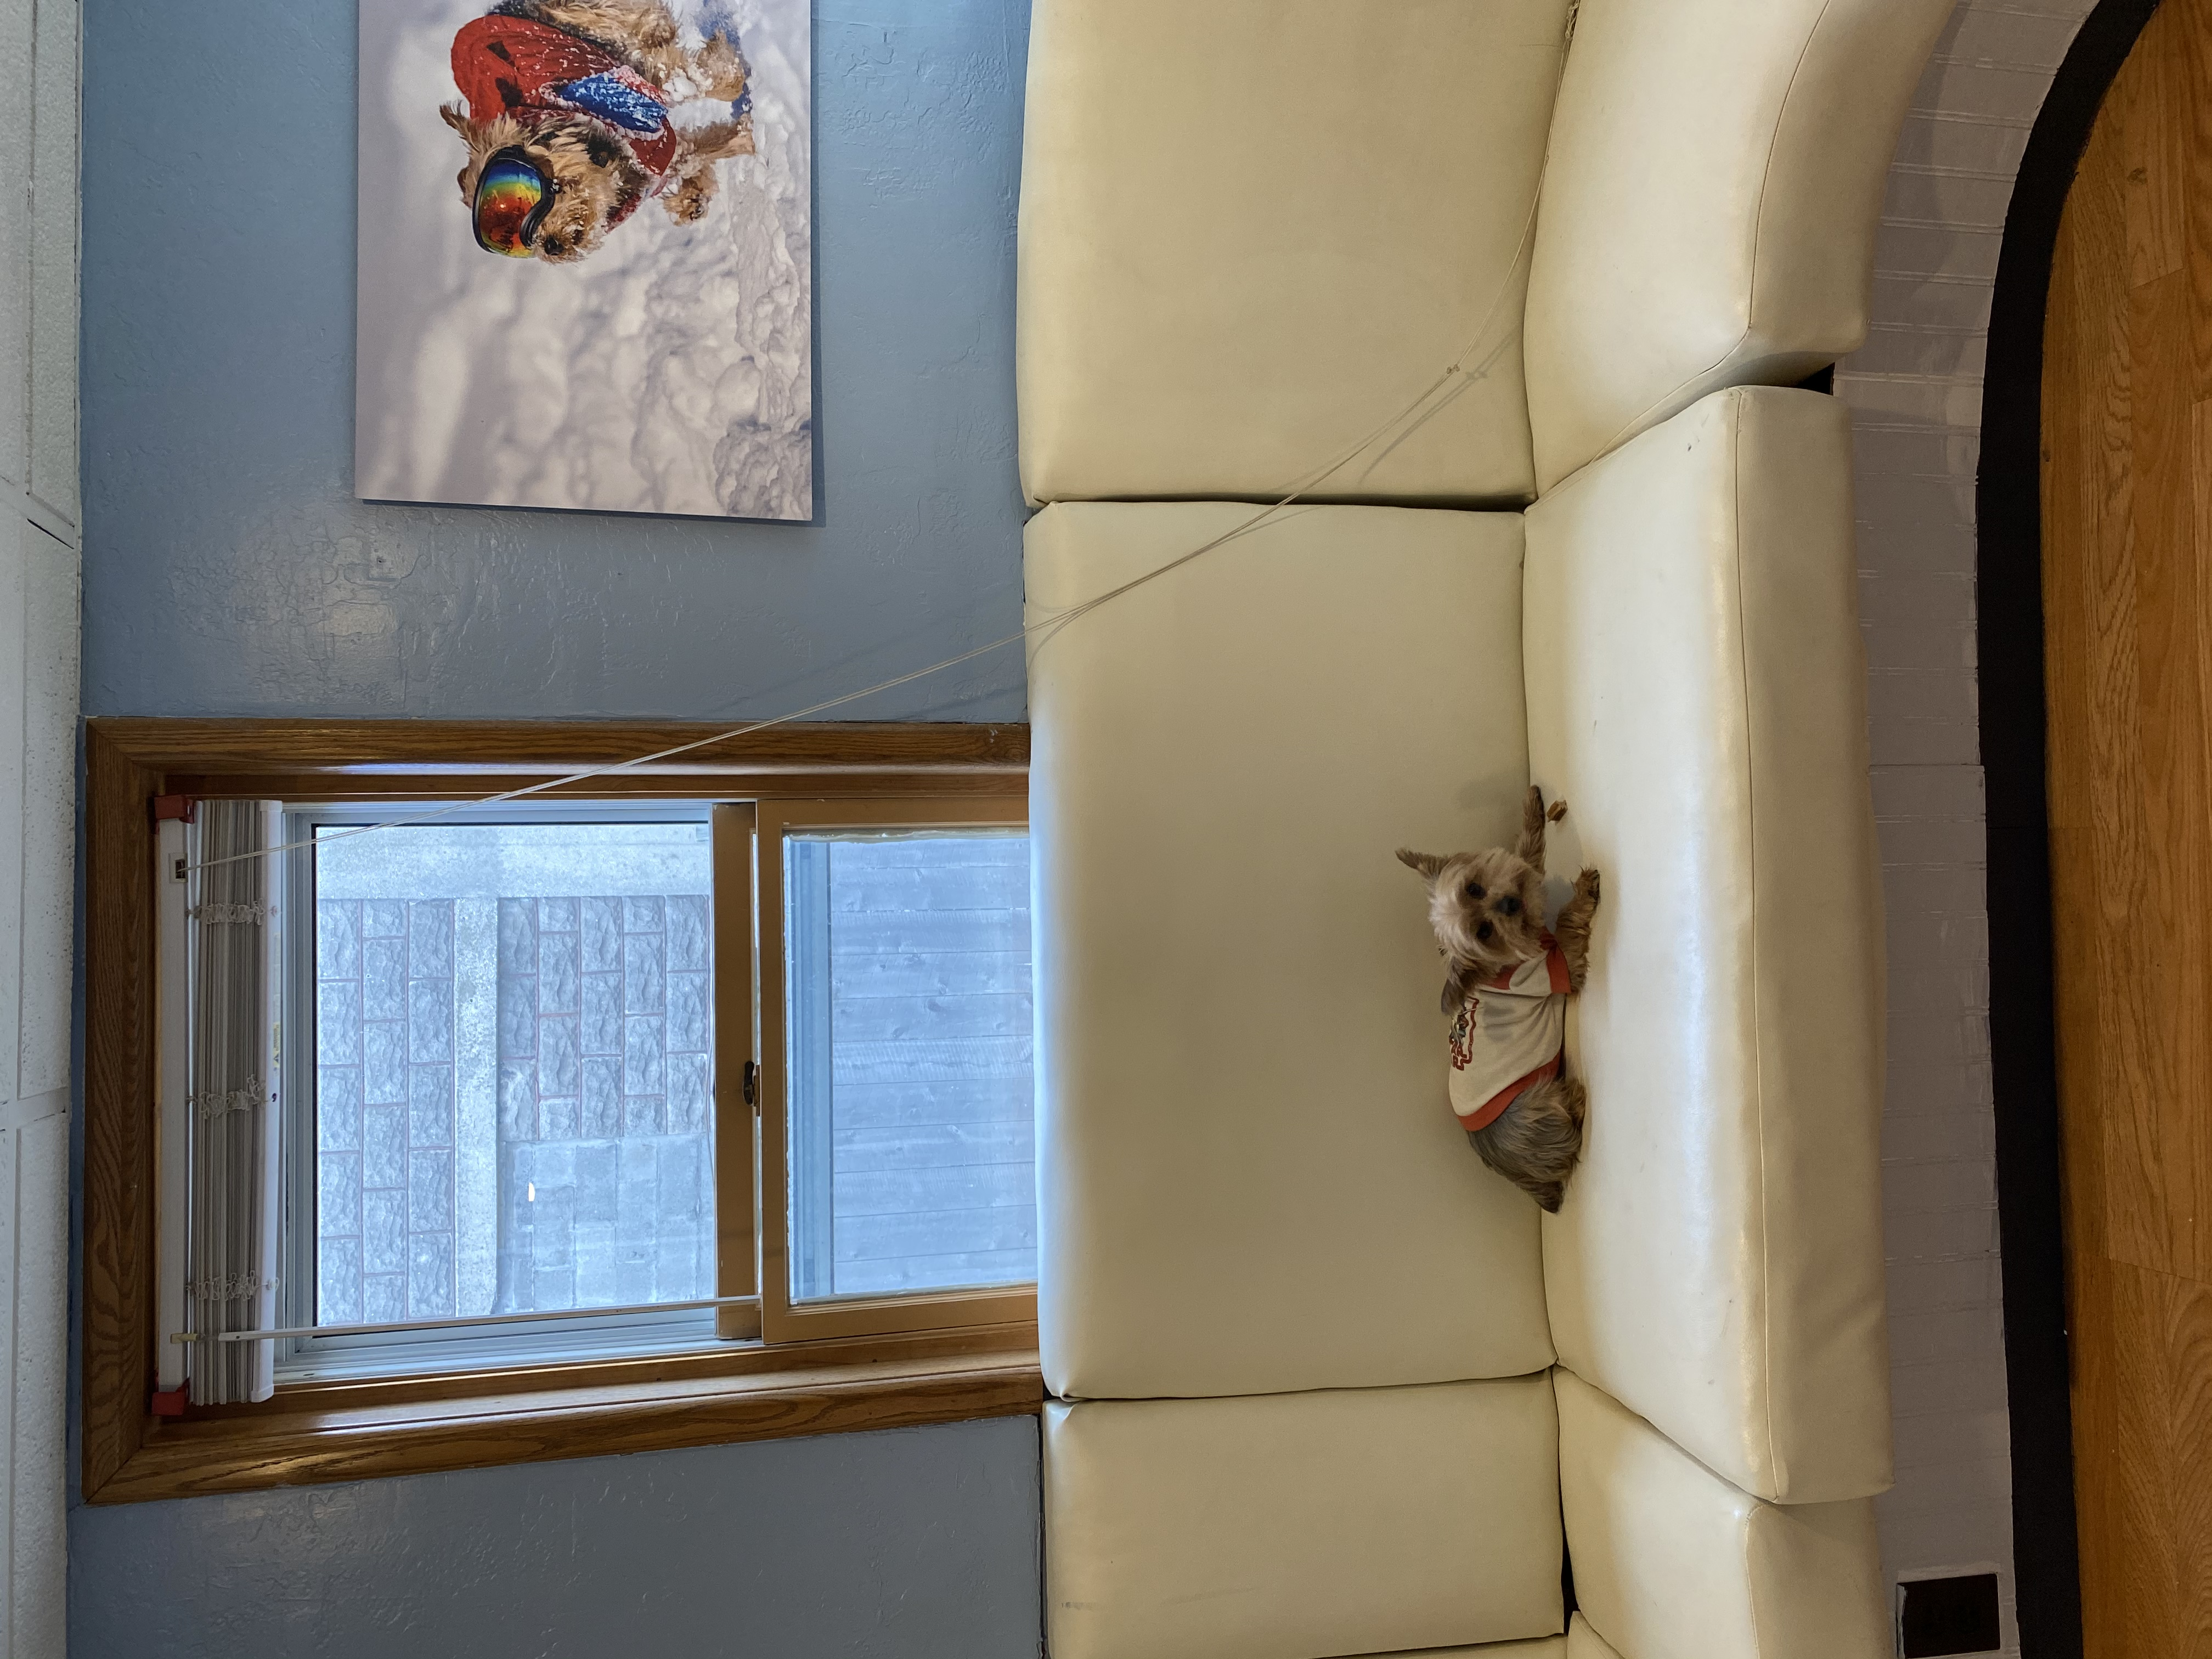 The Sprocket Lounge